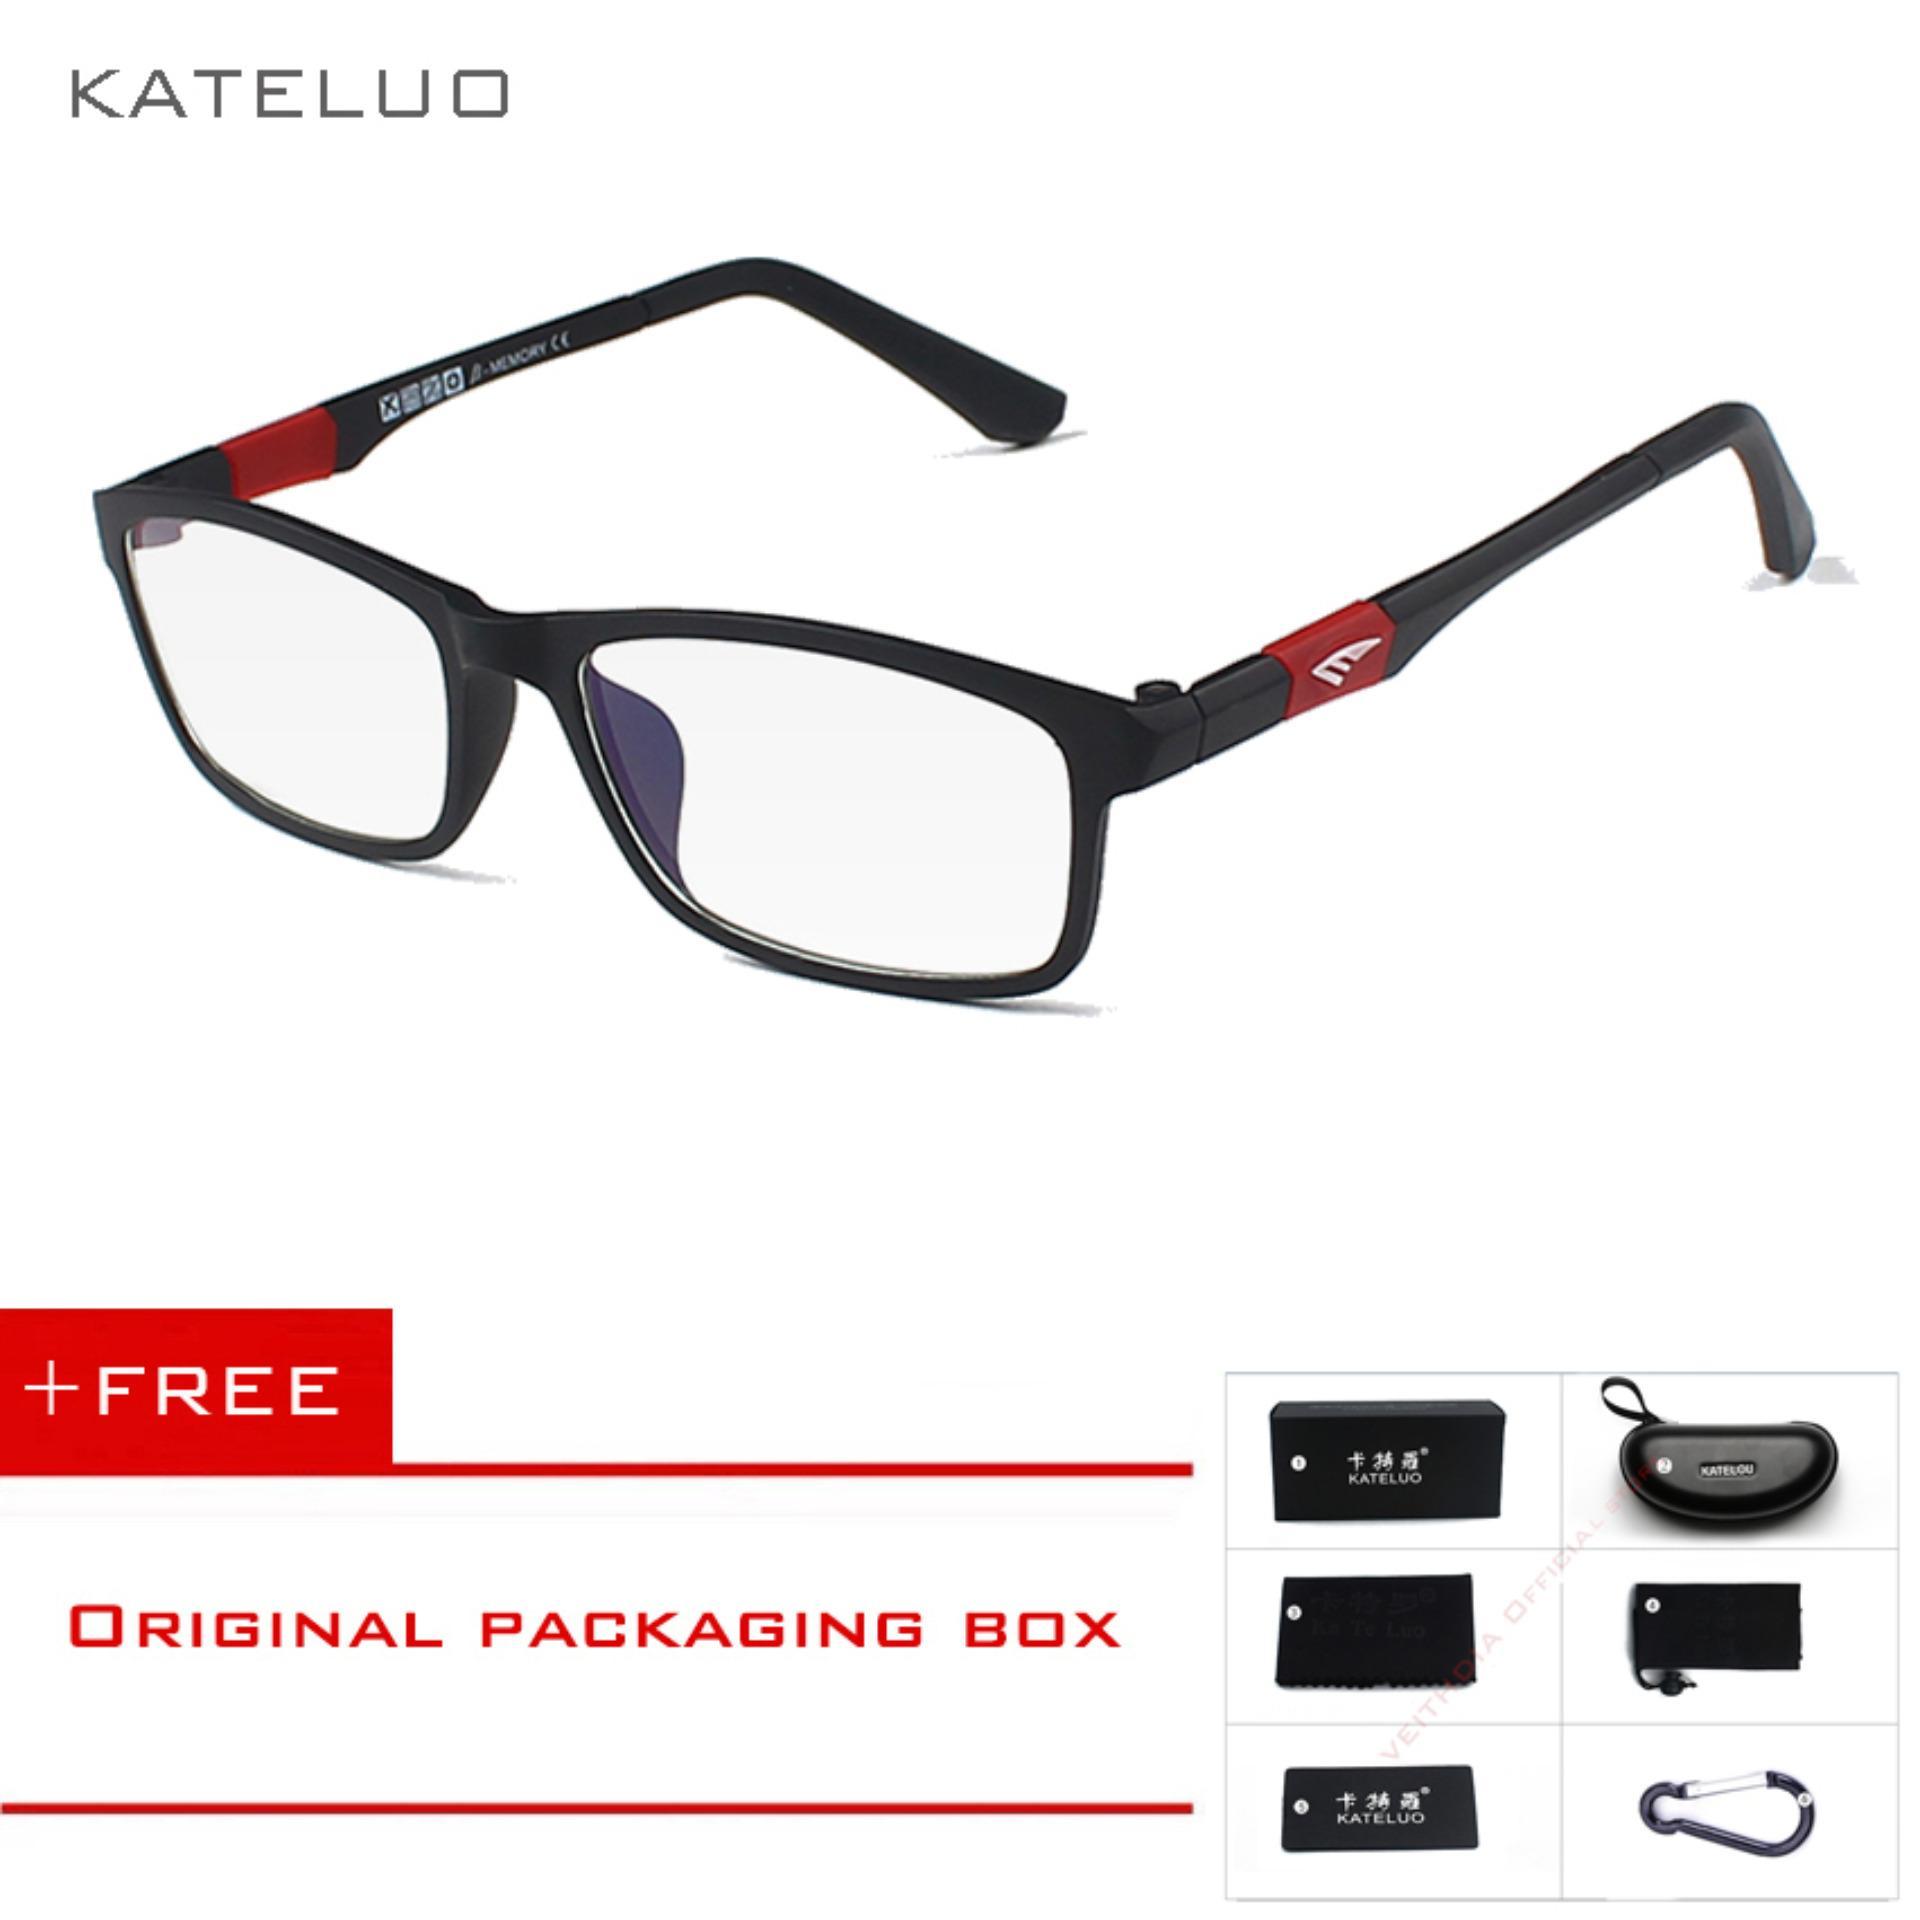 [INTERNATIONAL] KATELUO baru baca komputer merek kacamata wanita Kacamata Pria kacamata radiasi ultra violet Kelelahan miopia bingkai Hitam putih bule 13022